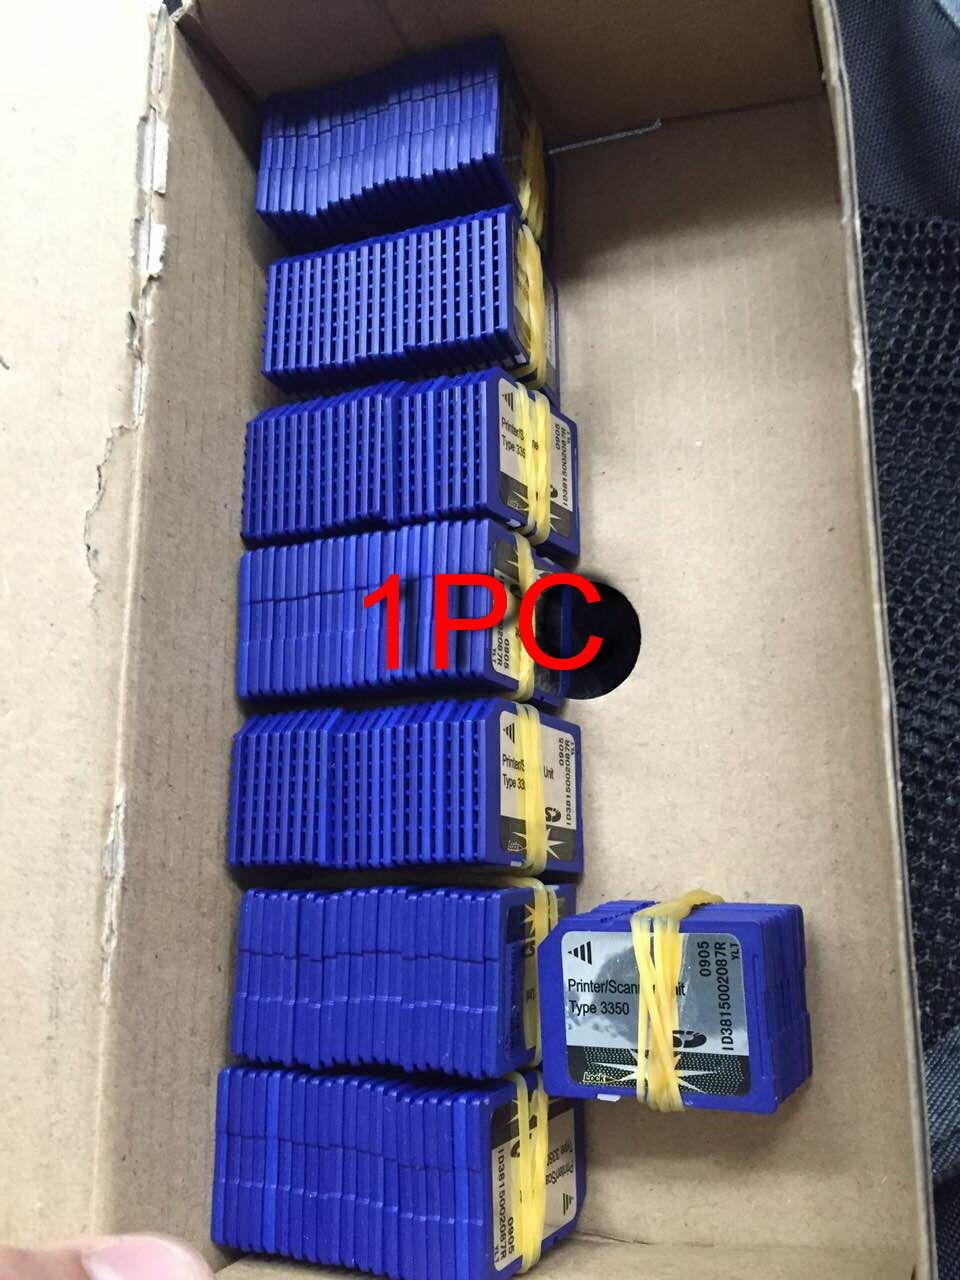 SD CARD FOR  ricoh aficio 3025 Printer/Scanner Unit Type sd card<br>